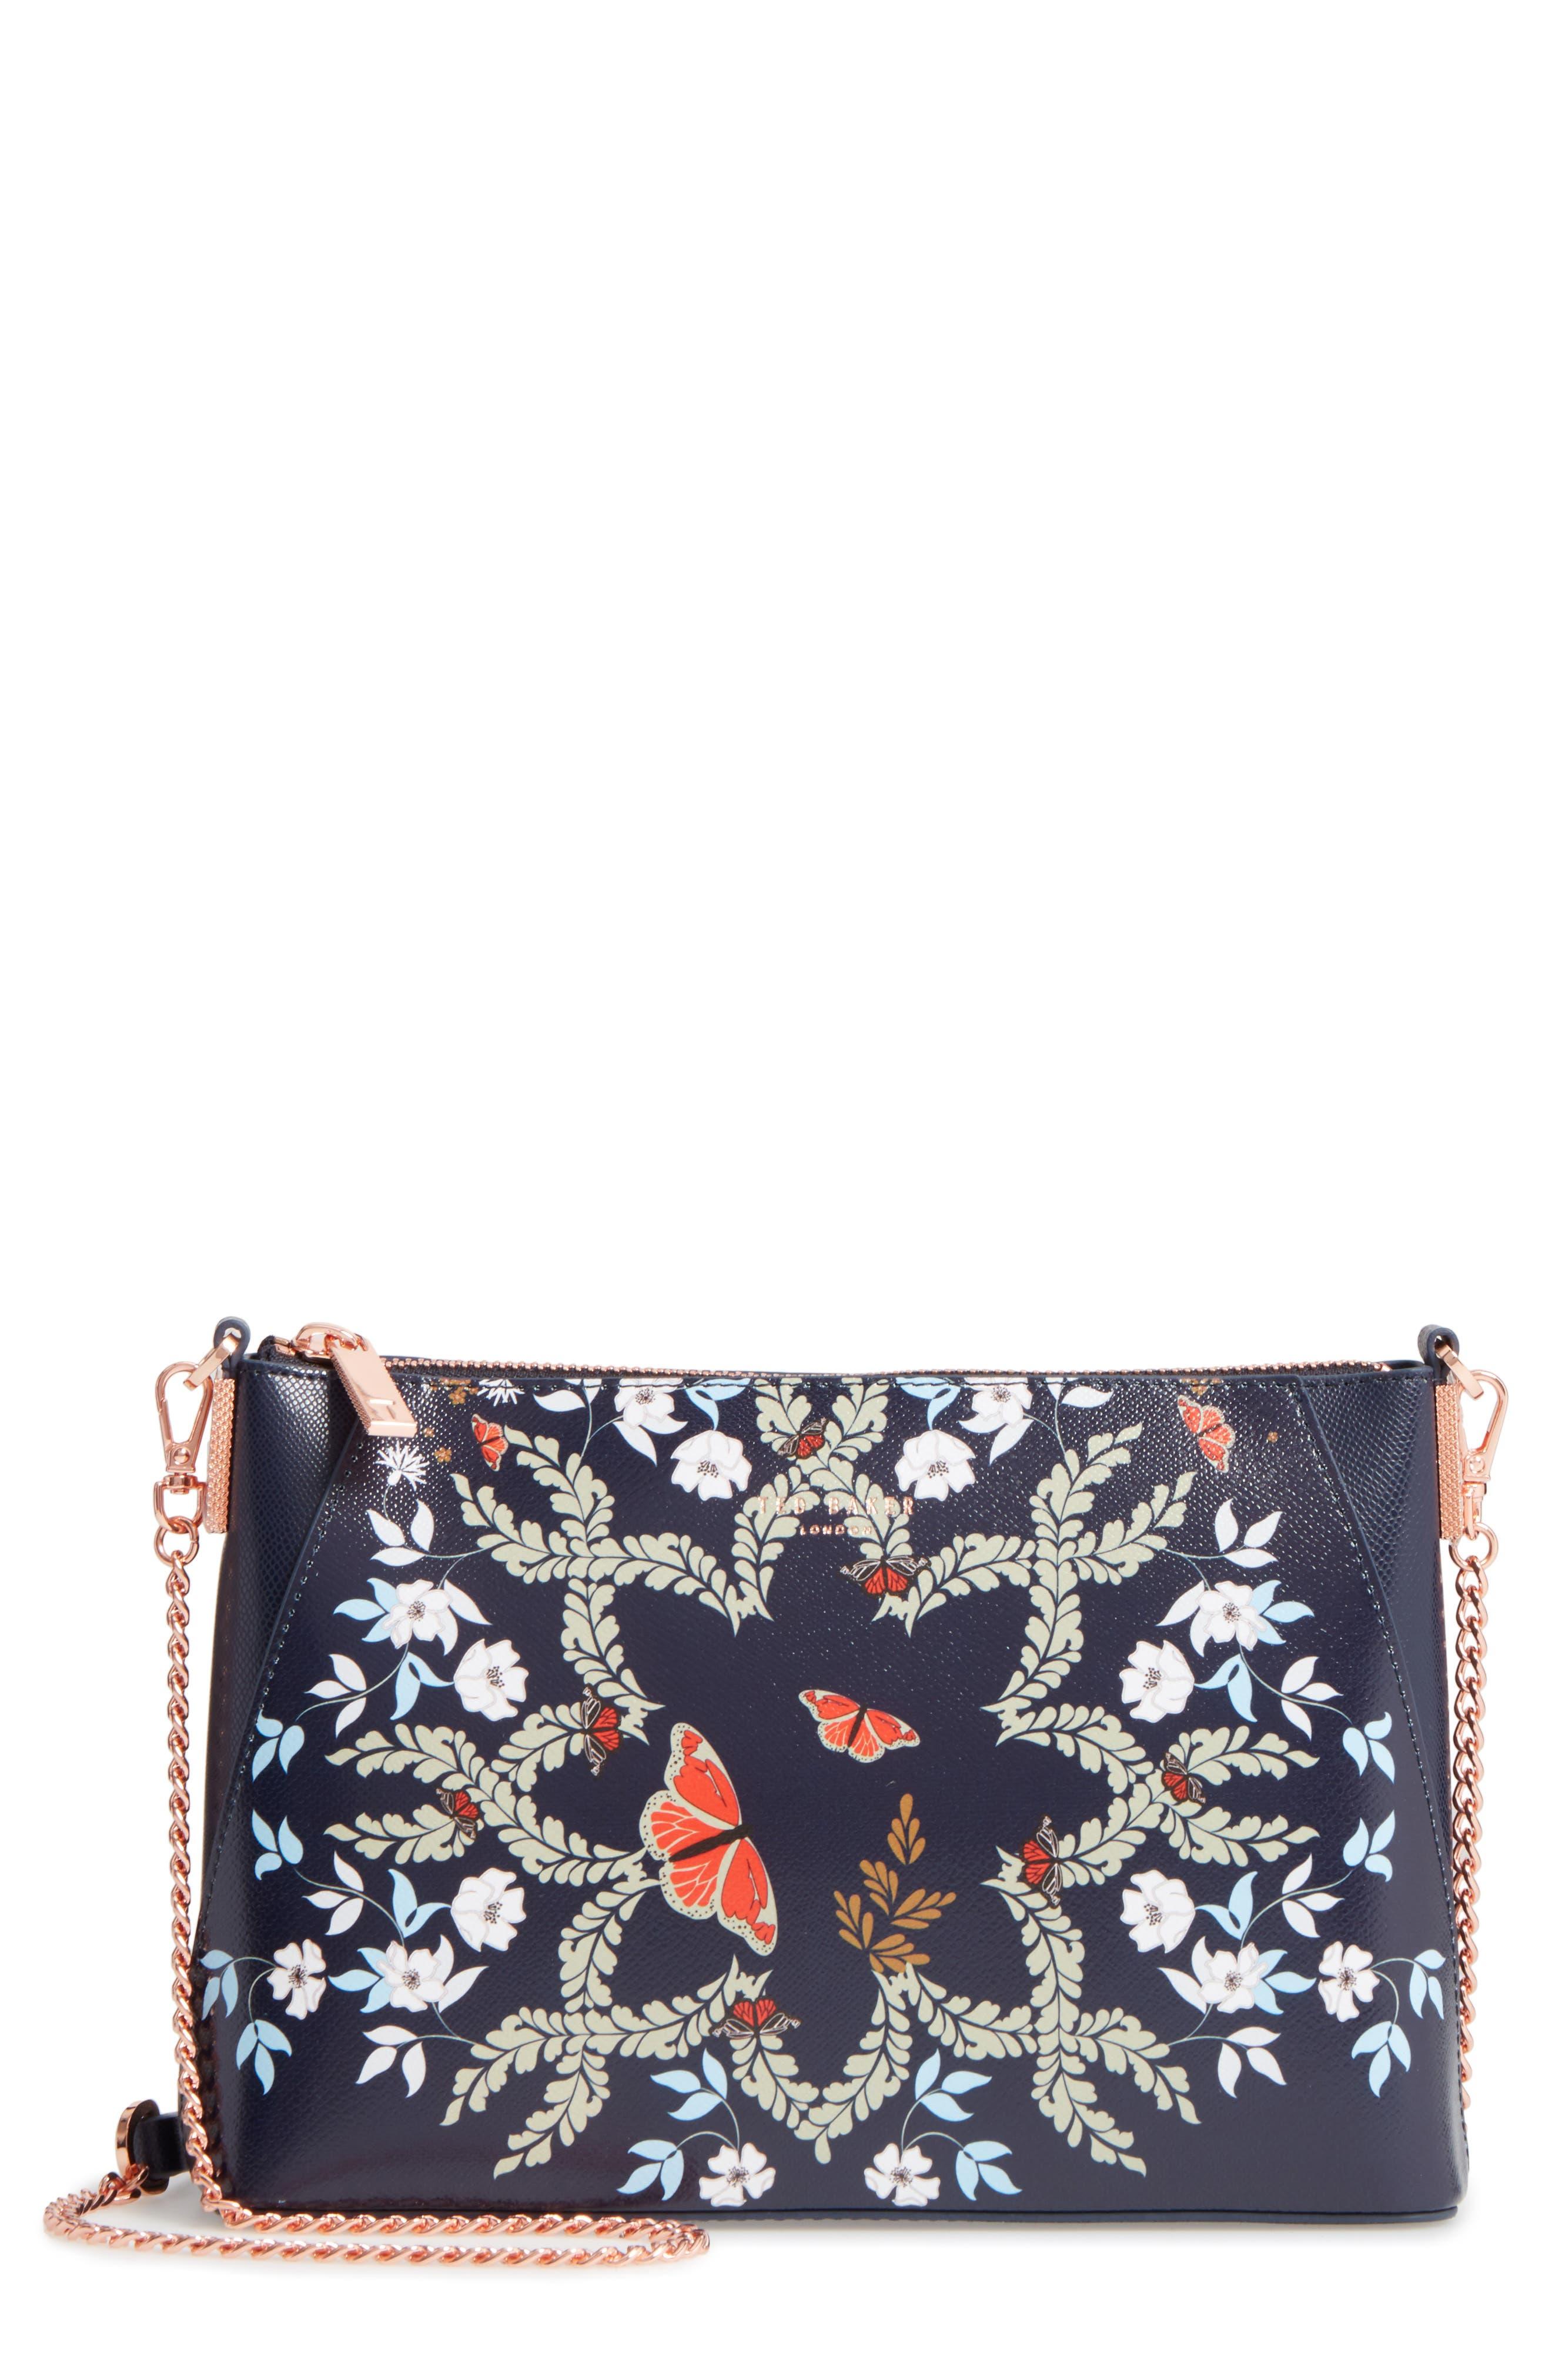 Marisiaa - Kyoto Gardens Leather Crossbody Bag,                             Main thumbnail 1, color,                             Mid Blue